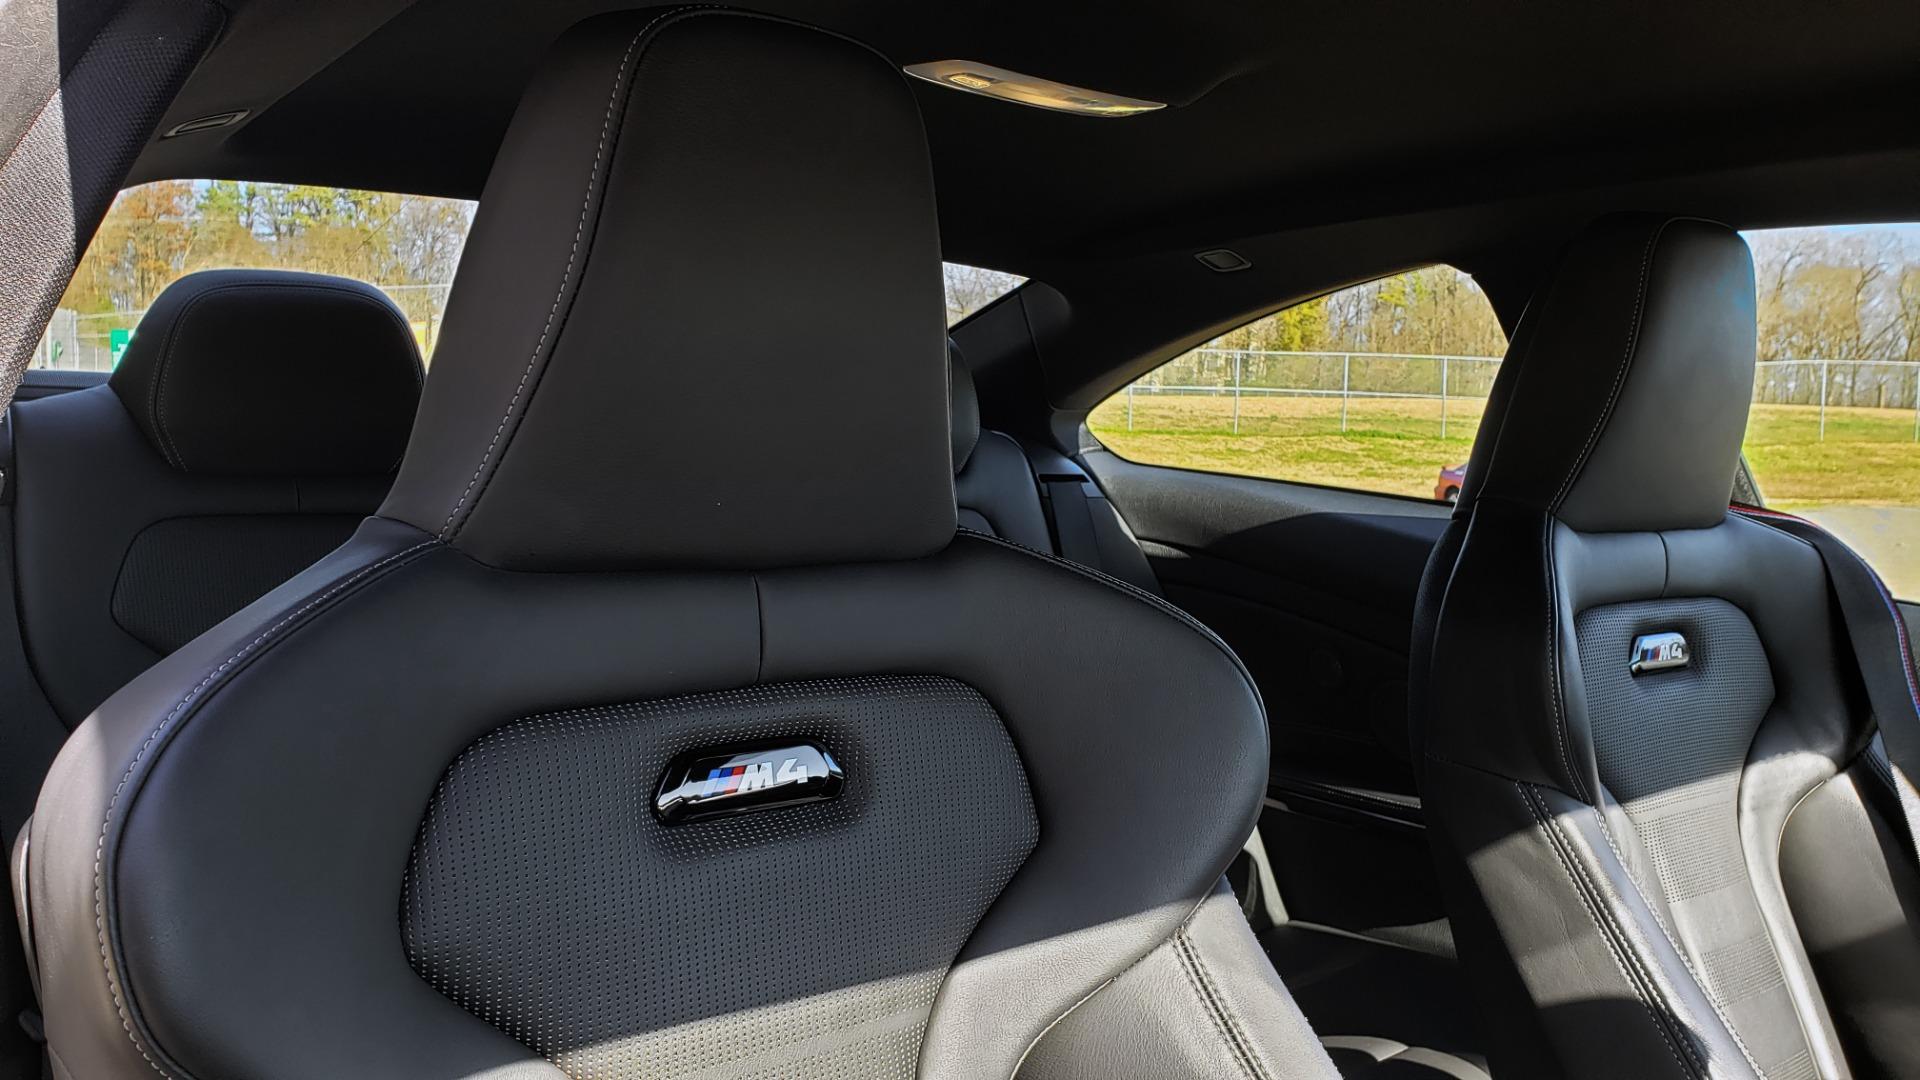 Used 2018 BMW M4 COMP PKG / EXEC / M-DRIVER / PARK CNTRL / ACTIVE BLIND SPOT for sale $45,449 at Formula Imports in Charlotte NC 28227 69